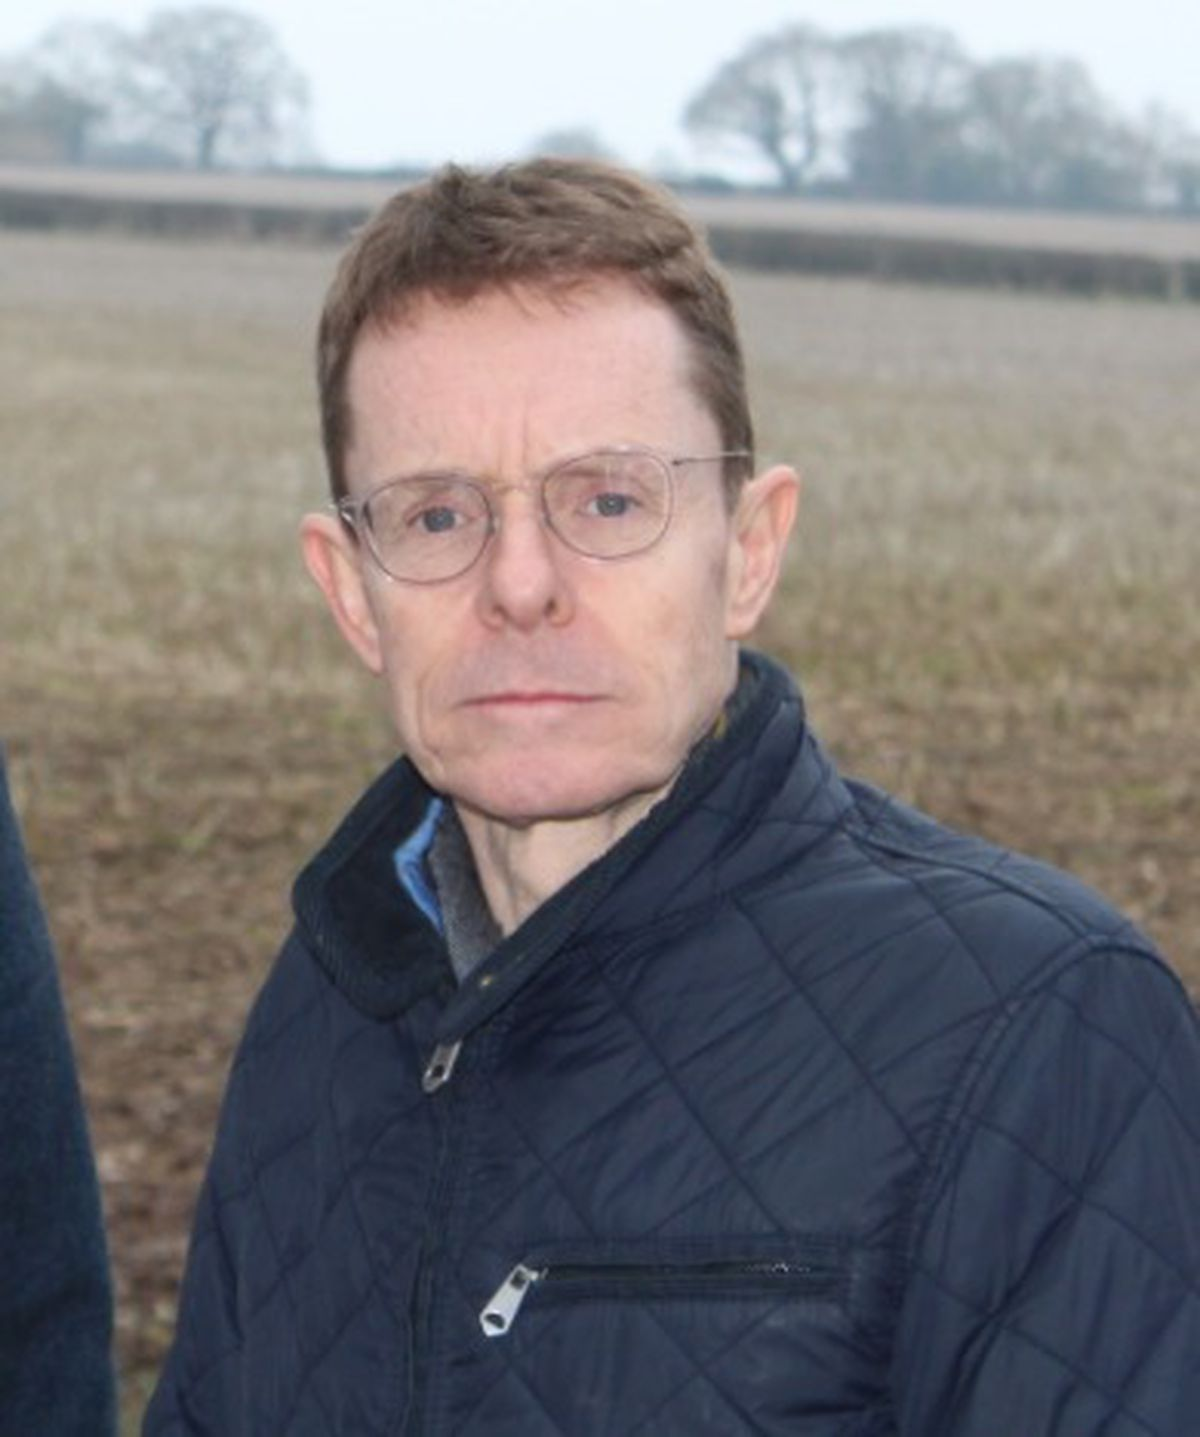 Headshot of West Midlands Mayor Andy Street.